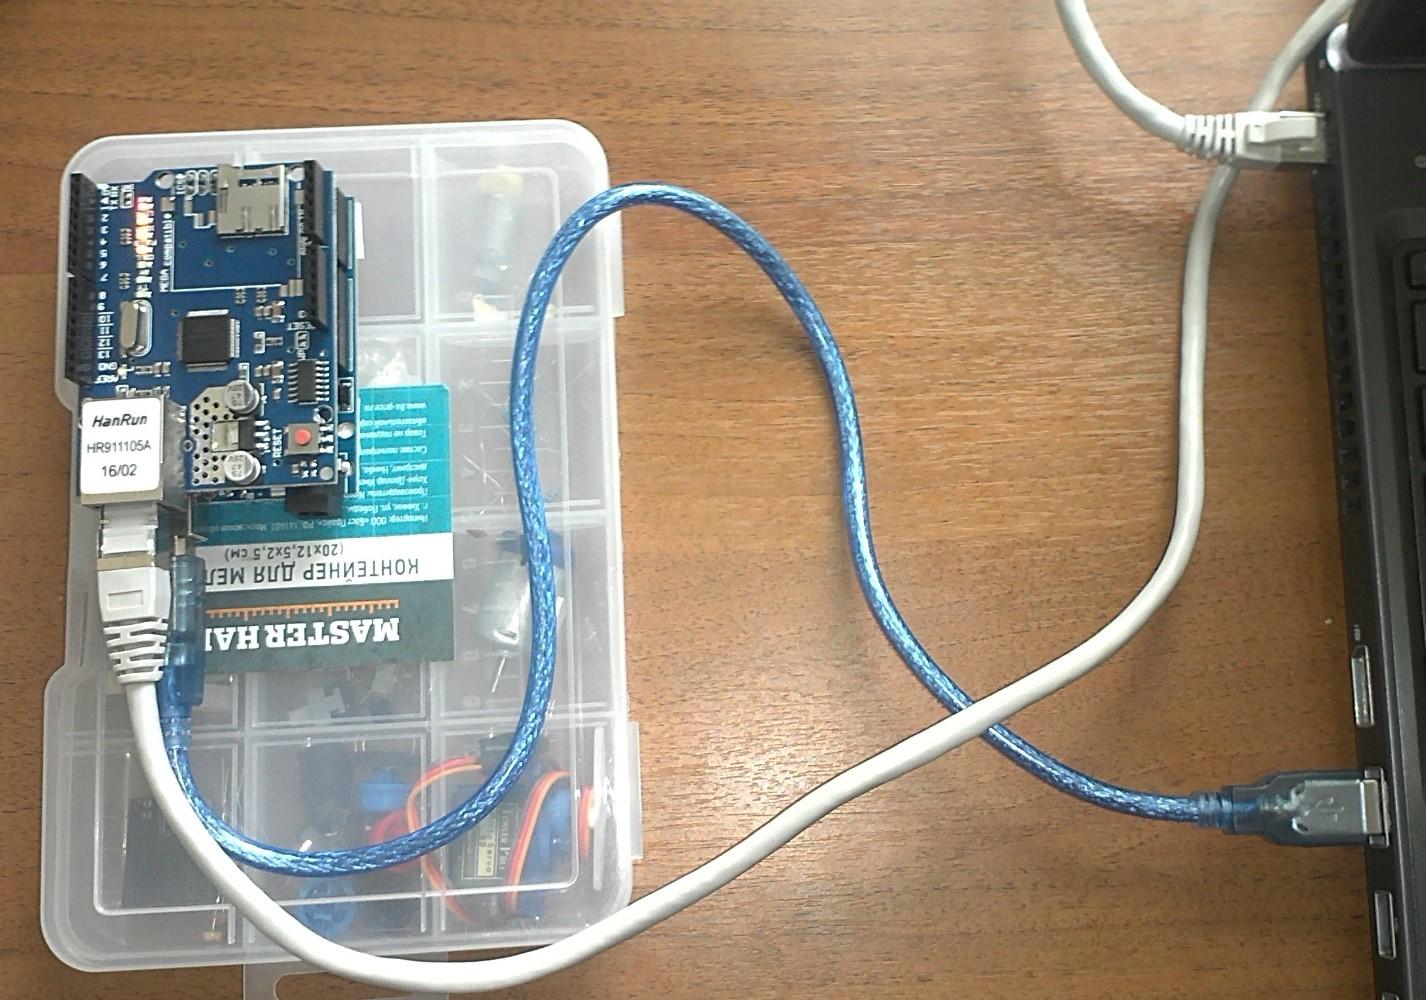 Как я писал библиотеку под МЭК 870-5-104 на Arduino при помощи Wireshark - 2